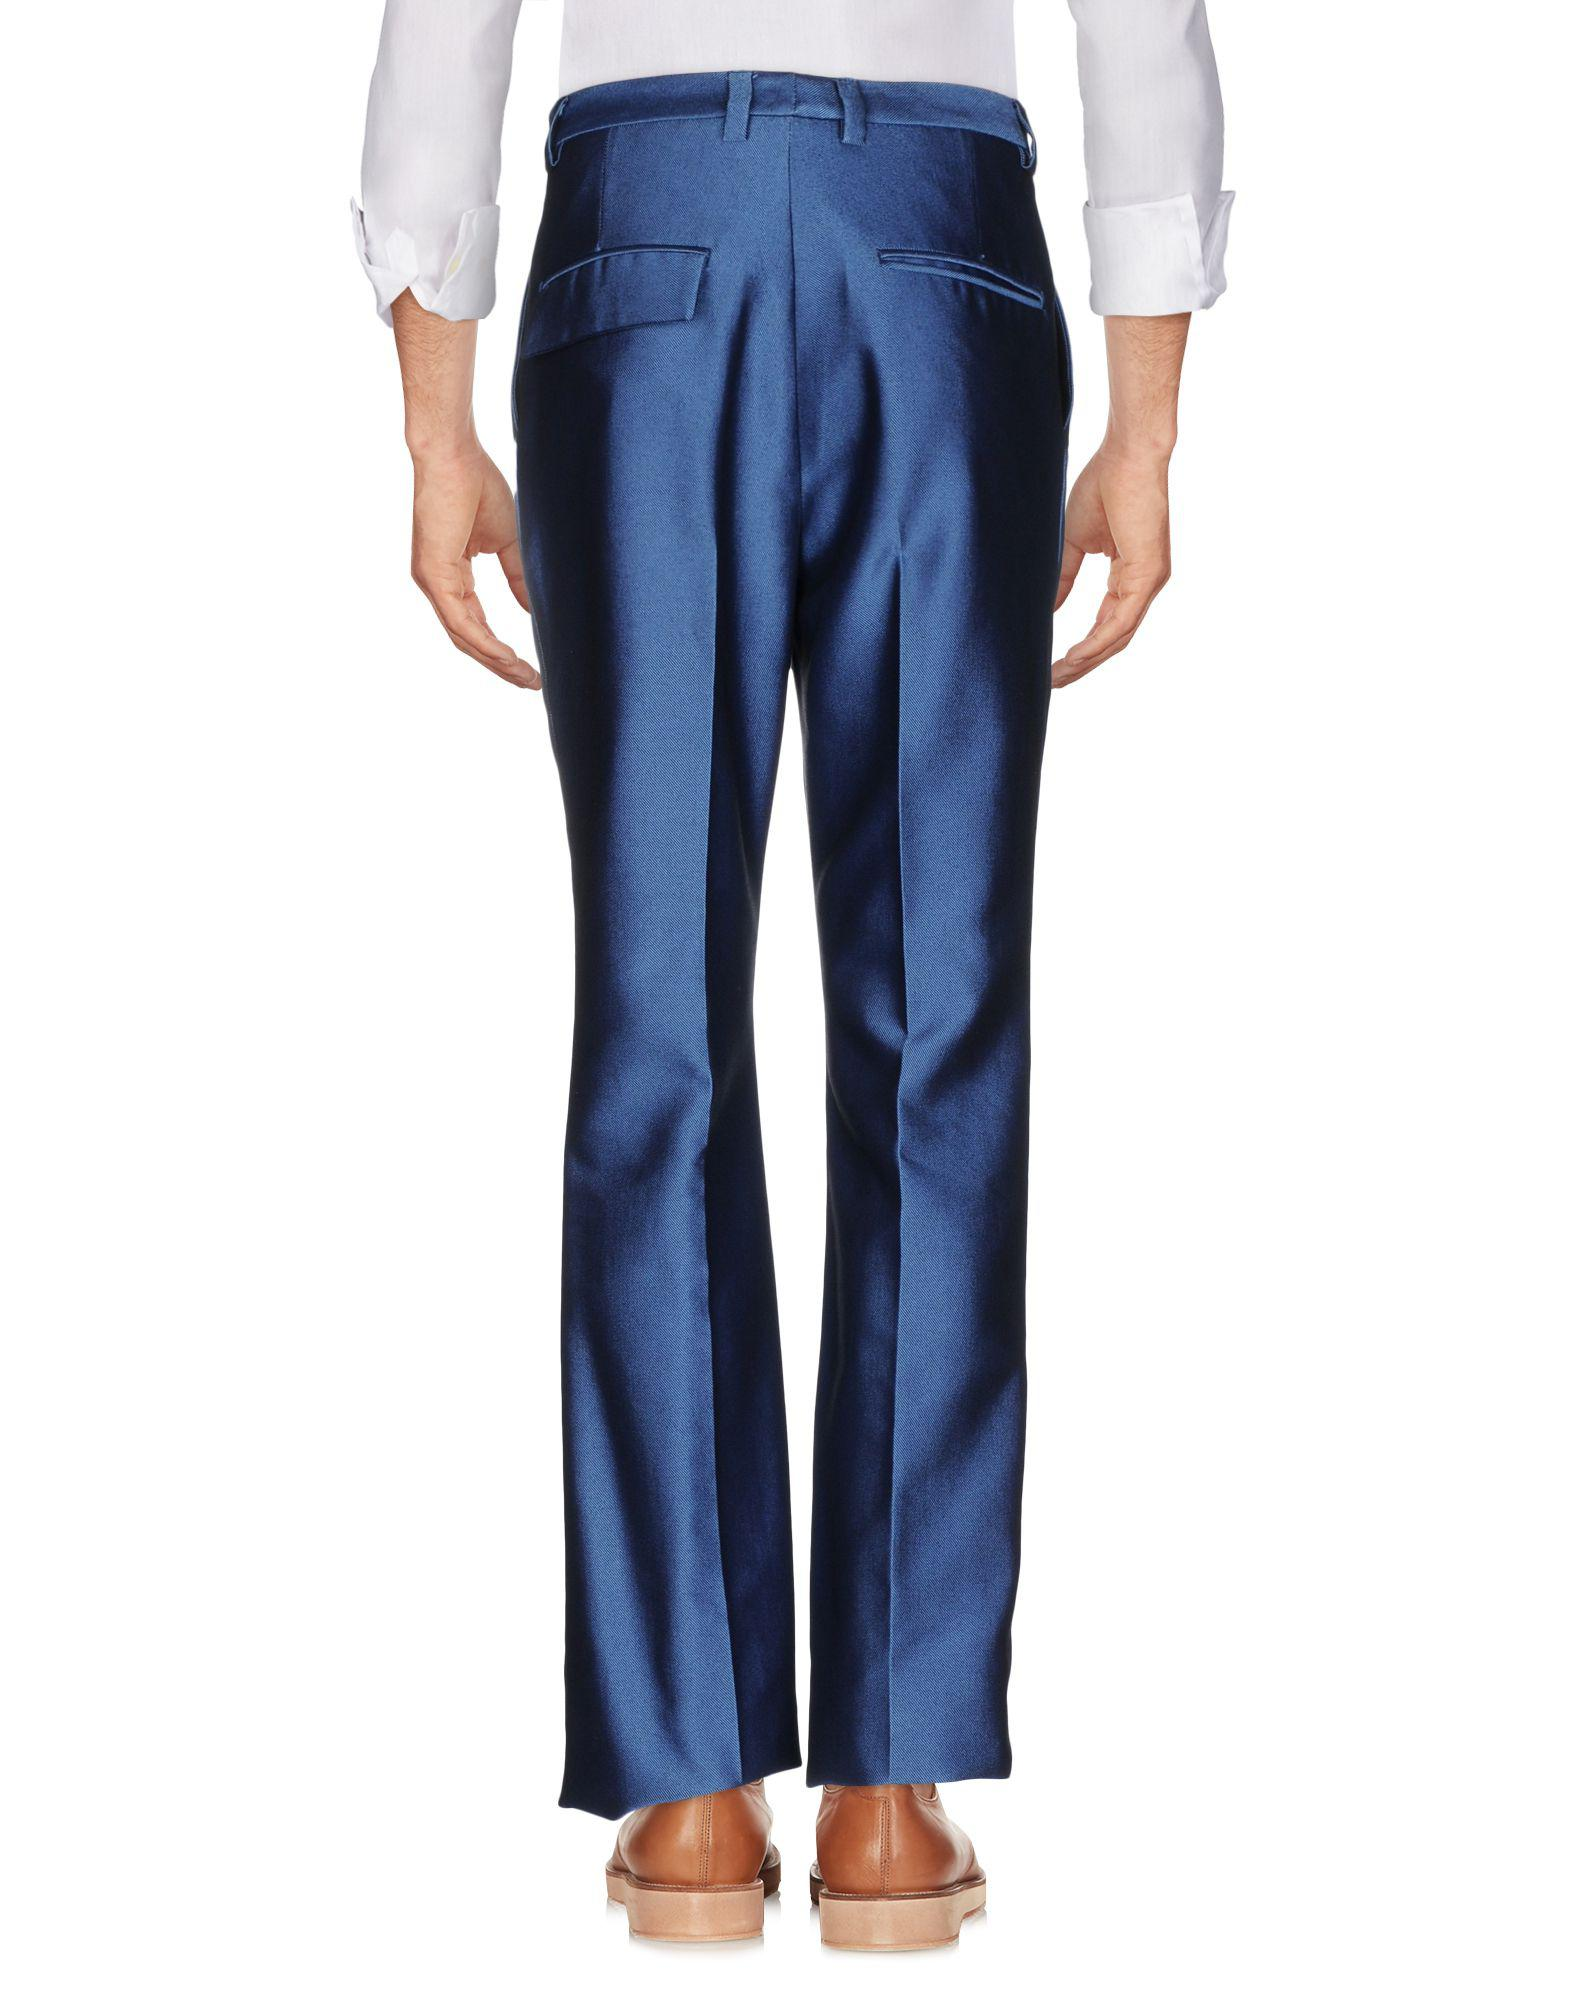 MSGM Cotton Casual Trouser in Pastel Blue (Blue) for Men